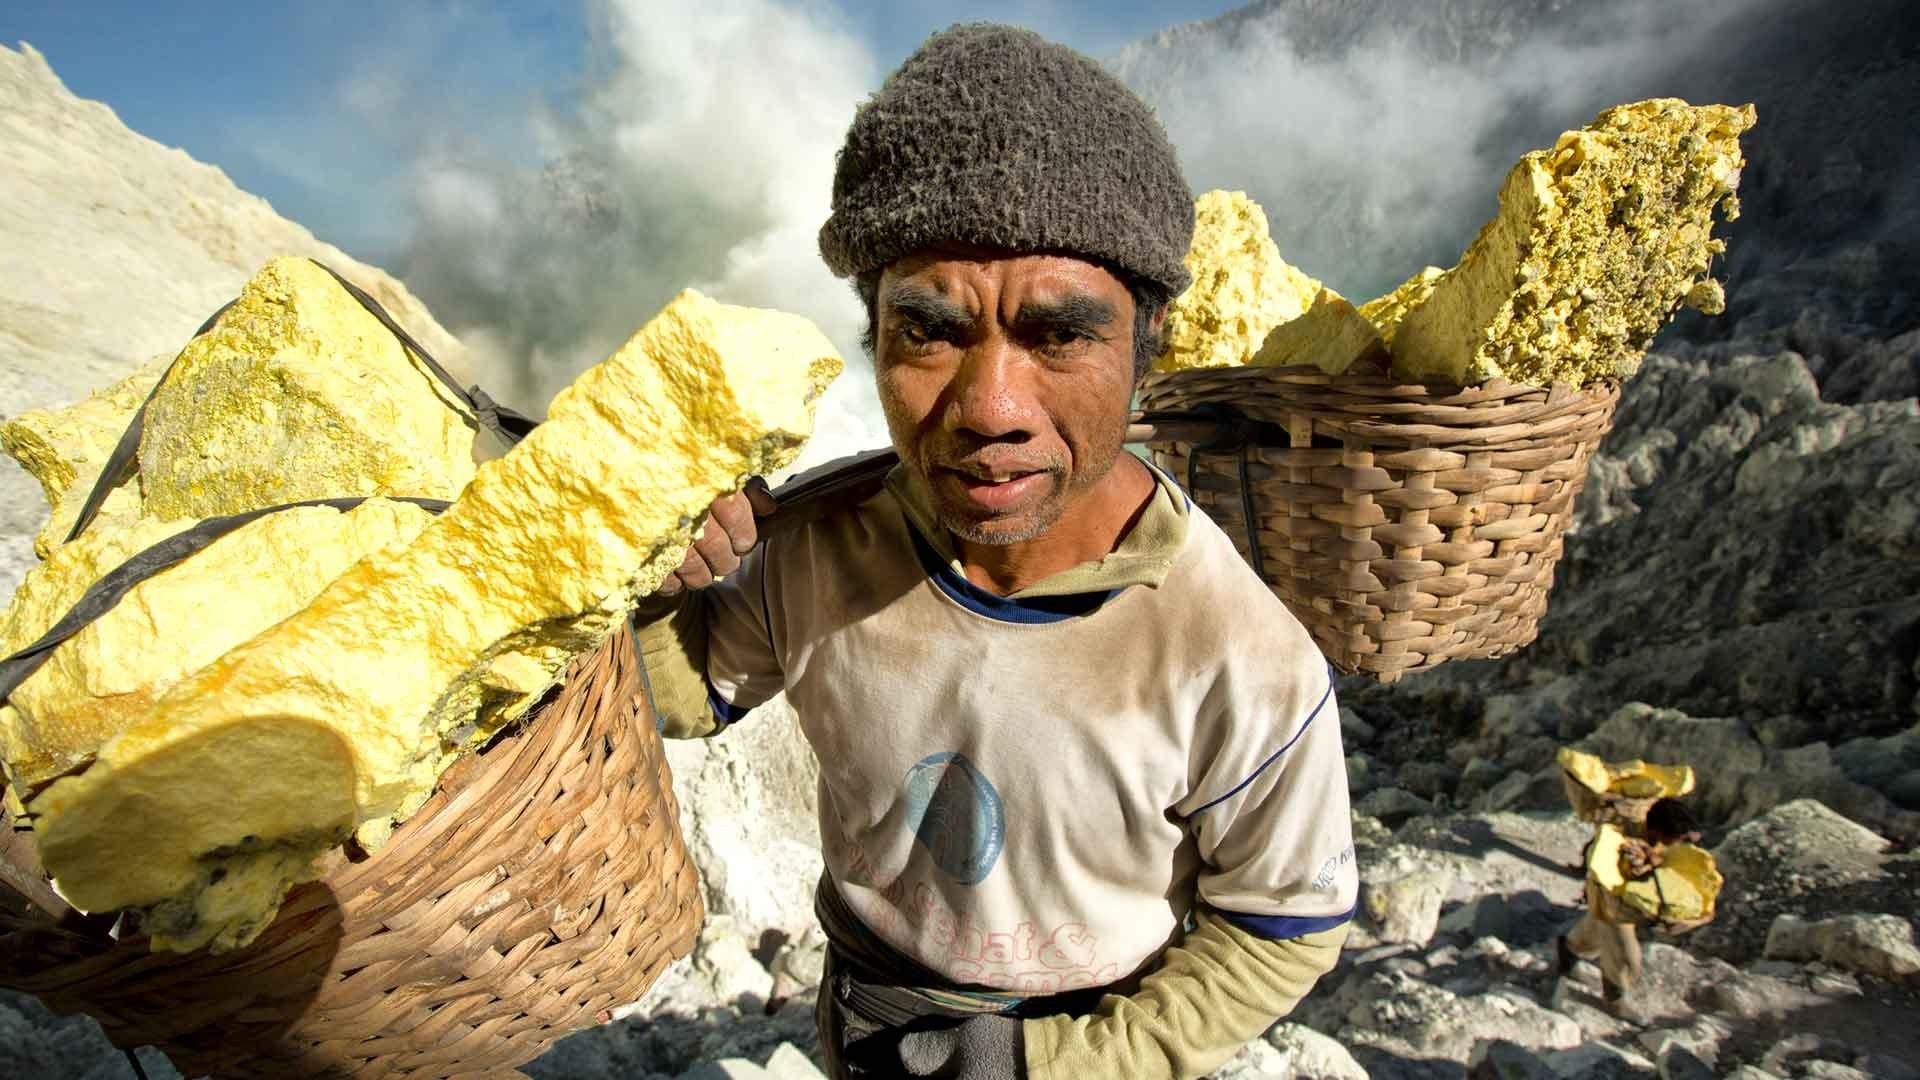 Artisanal miner in Indonesia